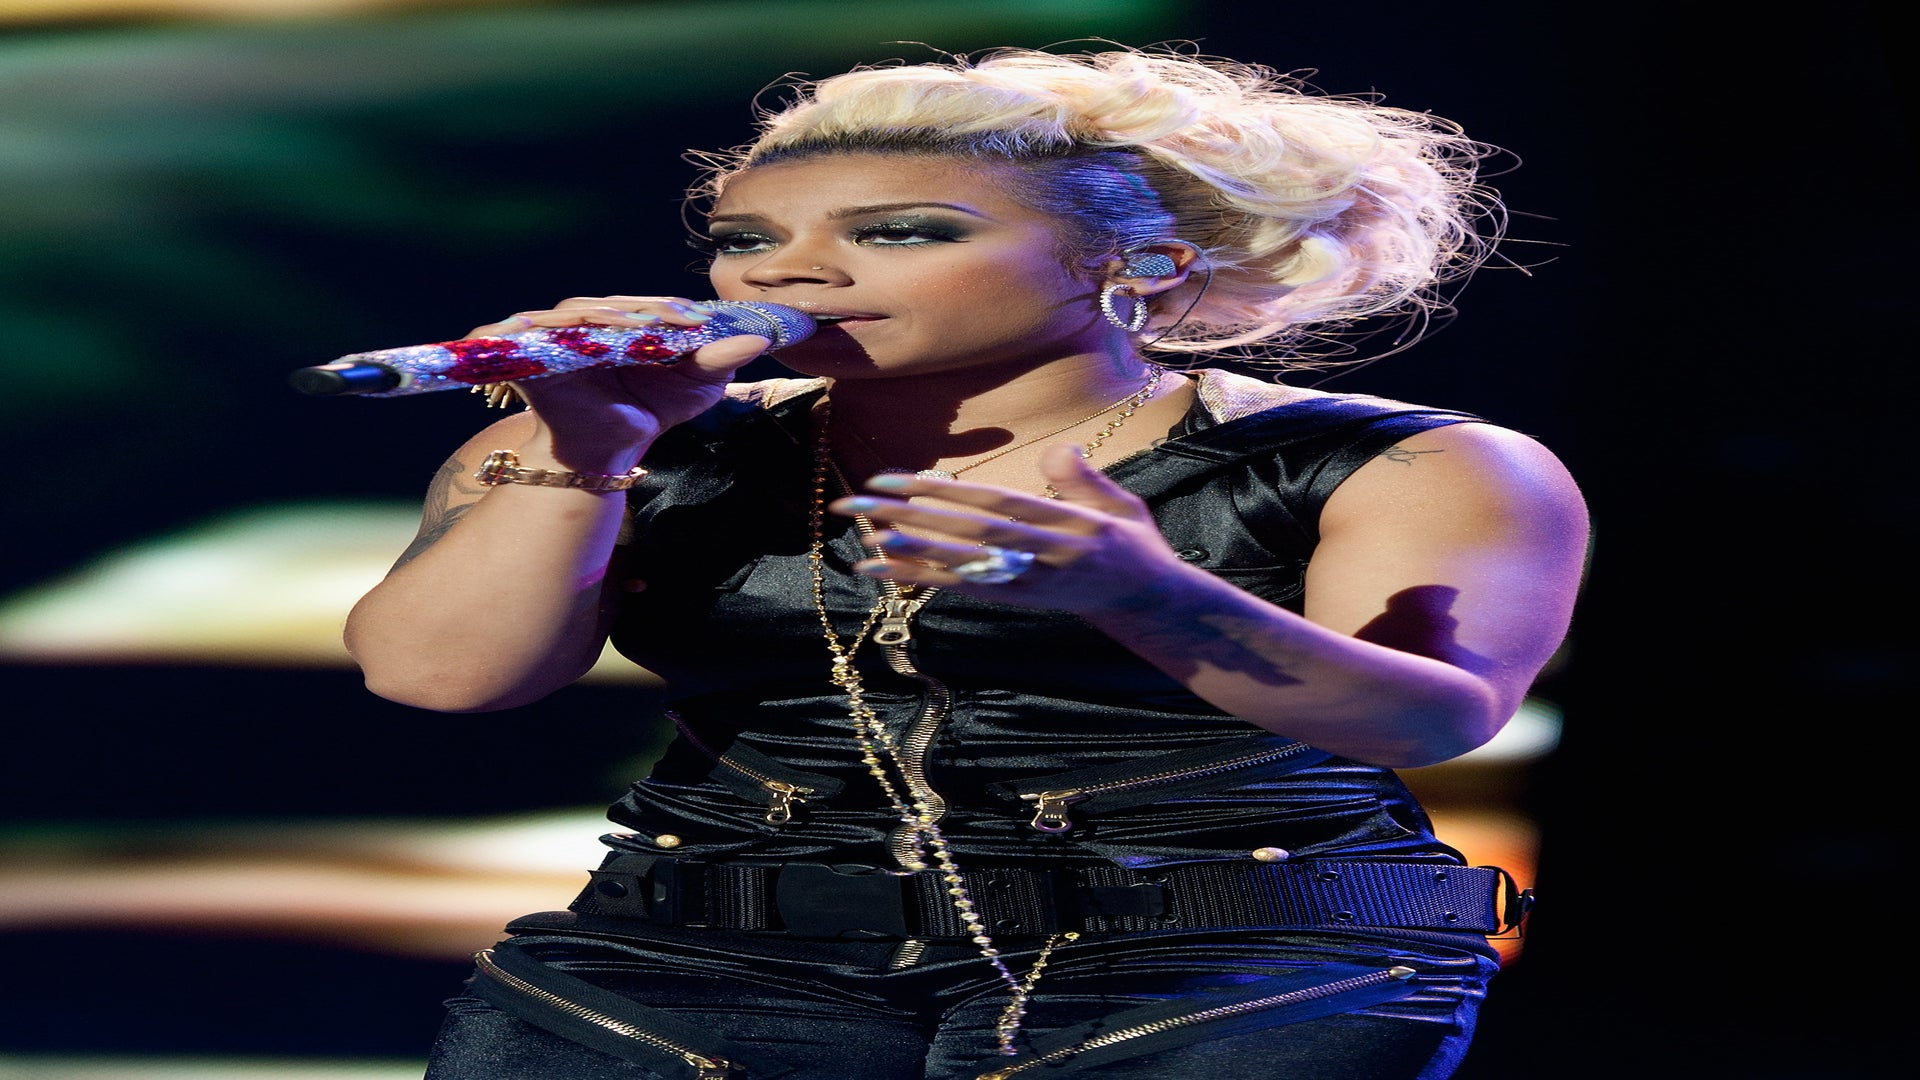 Keyshia Cole: Motherhood and Marriage Has Changed My Music, I'm Happy Now